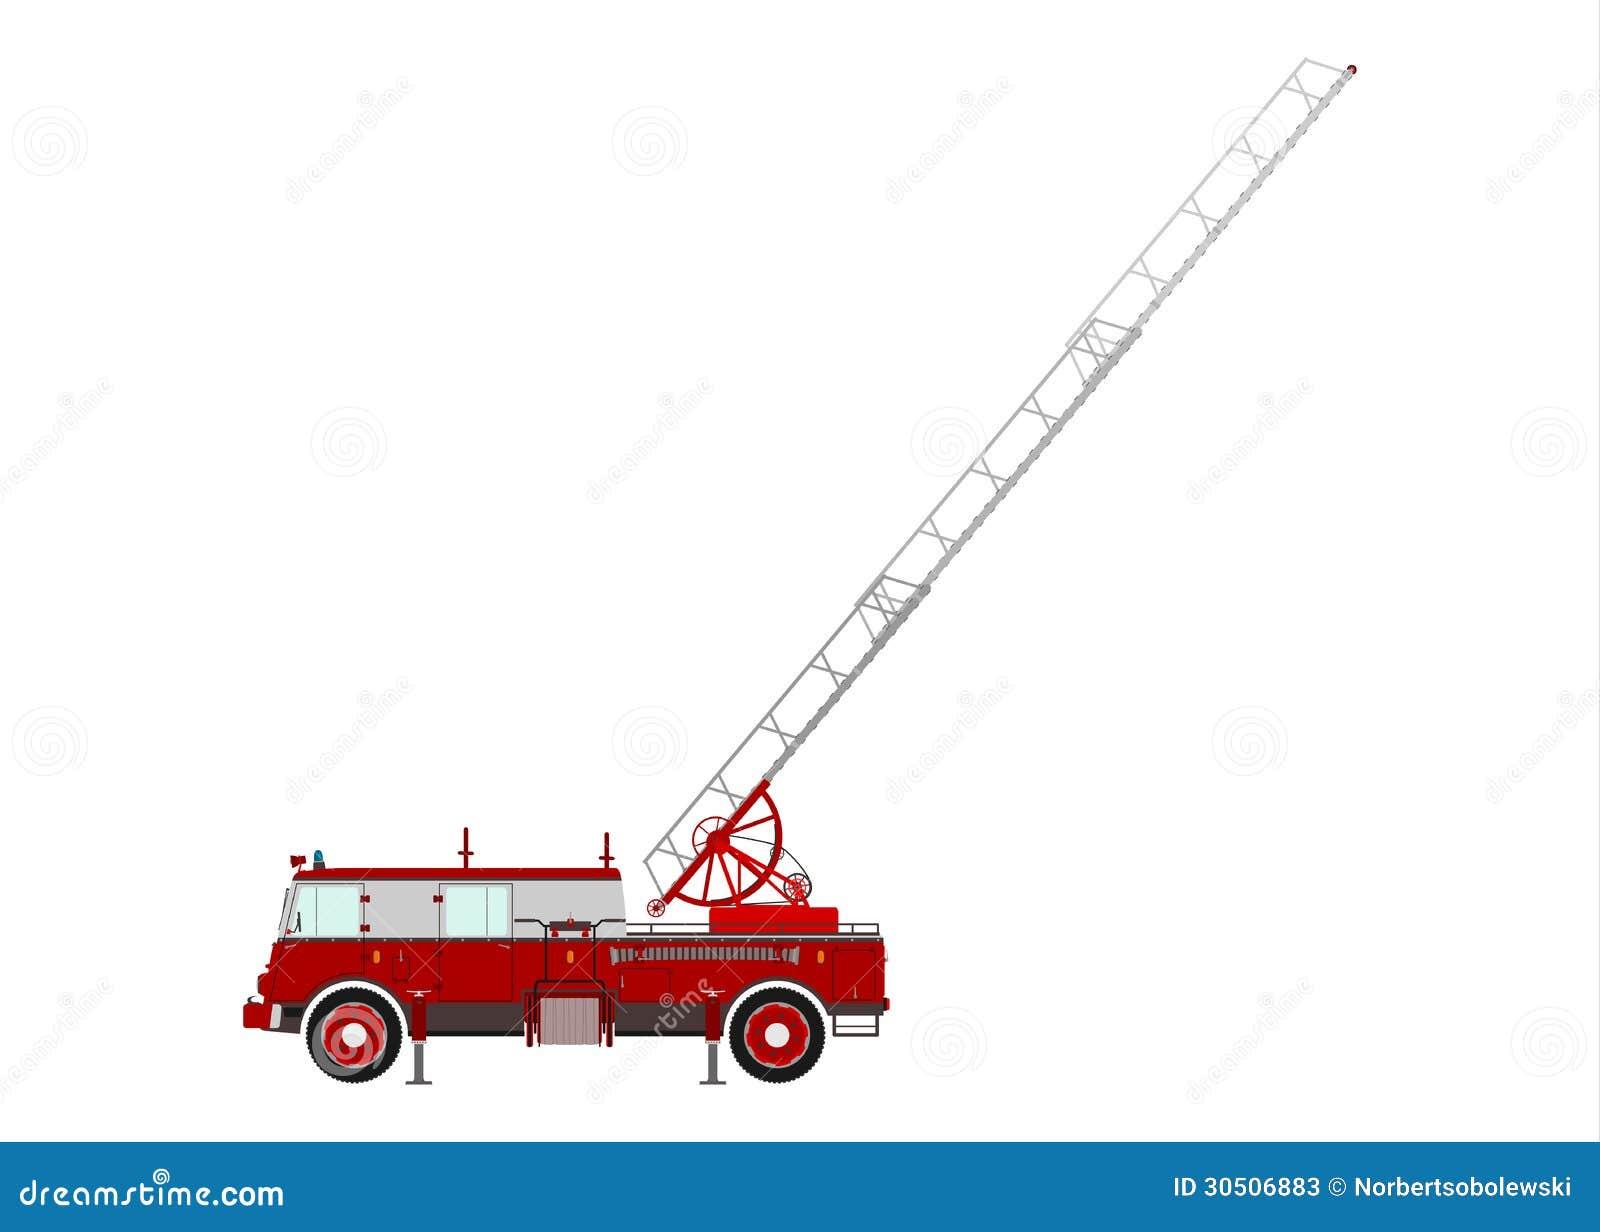 Wasser Mann Feuerwehrmann Fire Truck Cartoon GIF Ladder